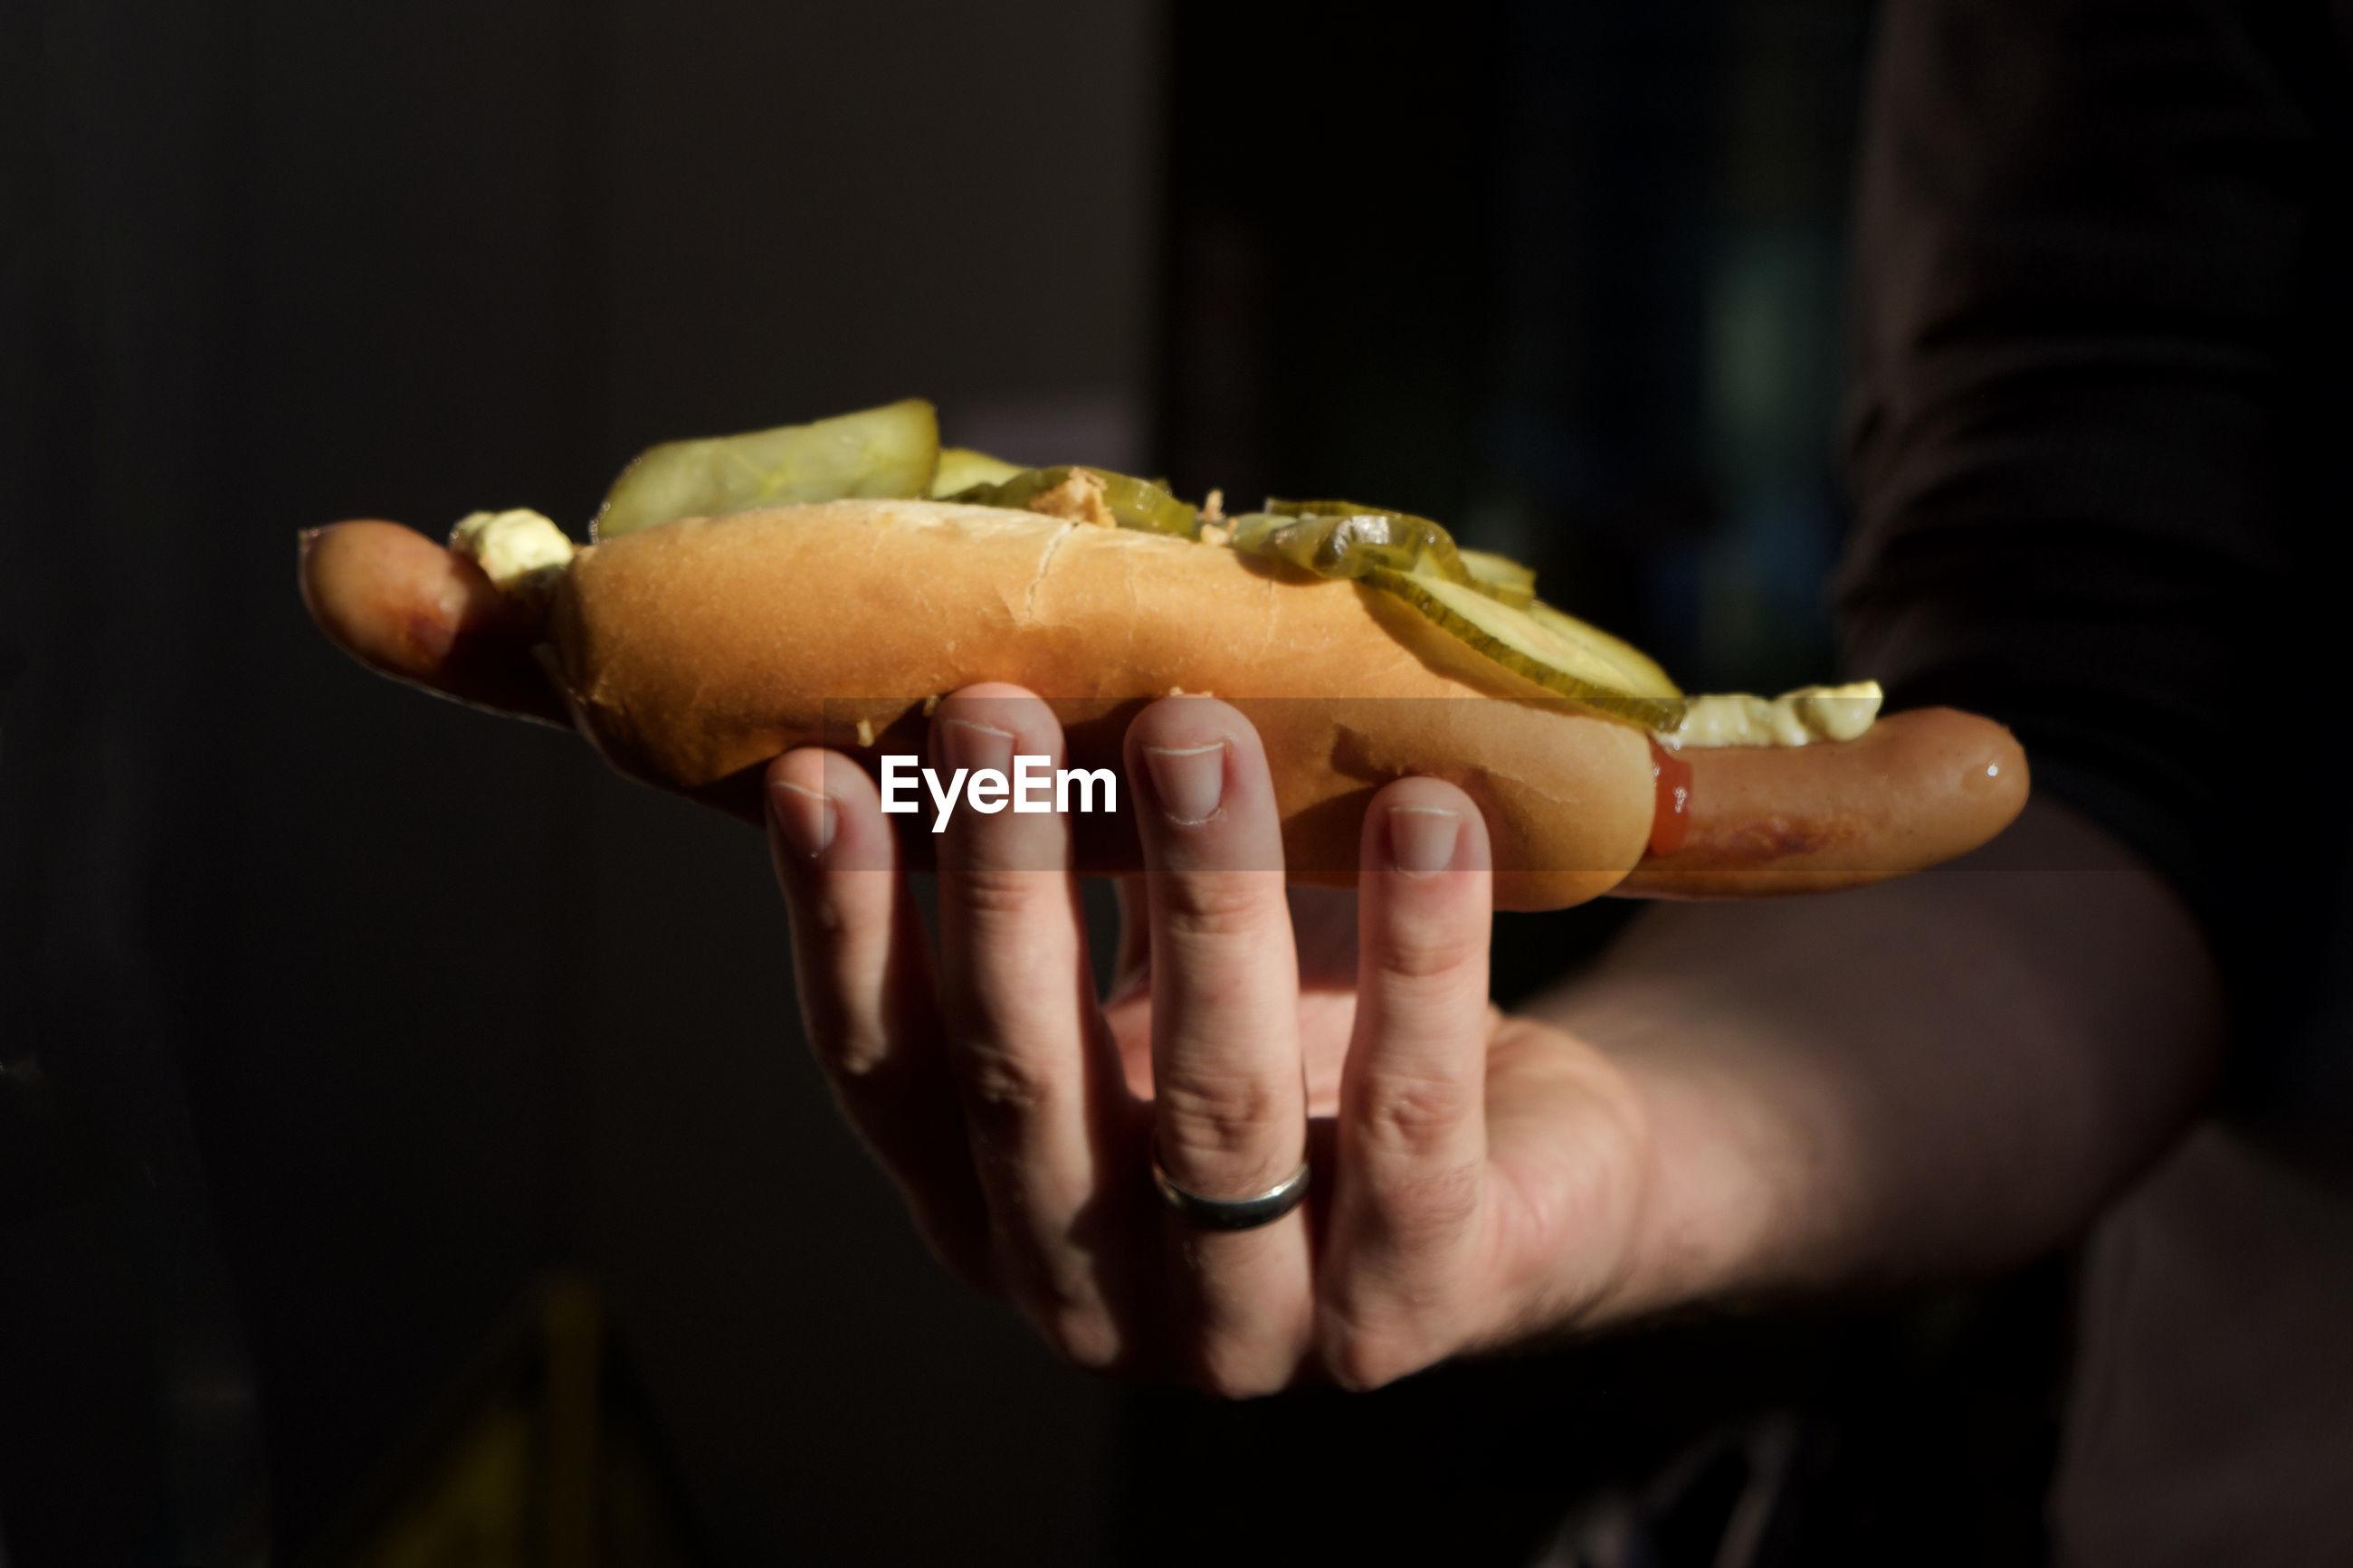 Close-up of hand holding hot dog